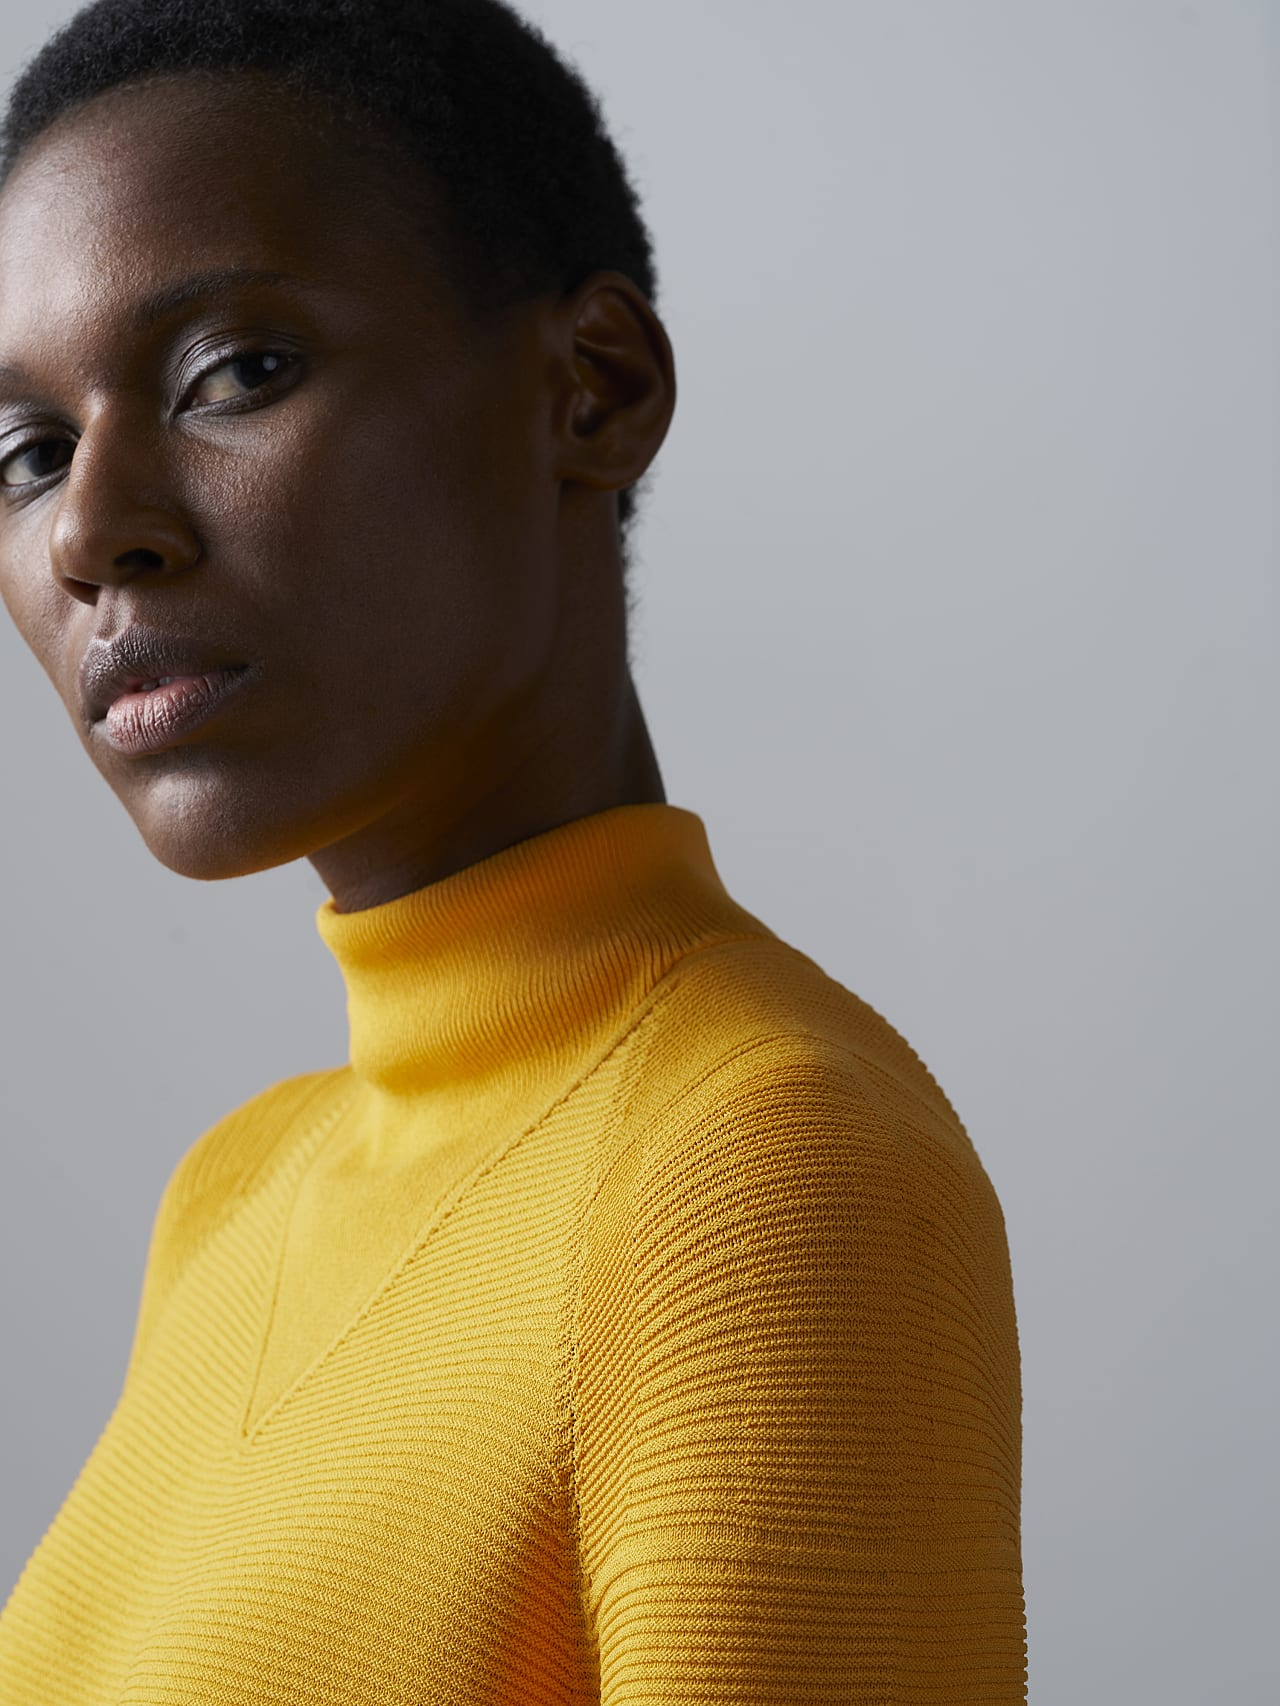 FOXEE V1.Y5.02 Seamless 3D Knit Mock-Neck Dress yellow Extra Alpha Tauri